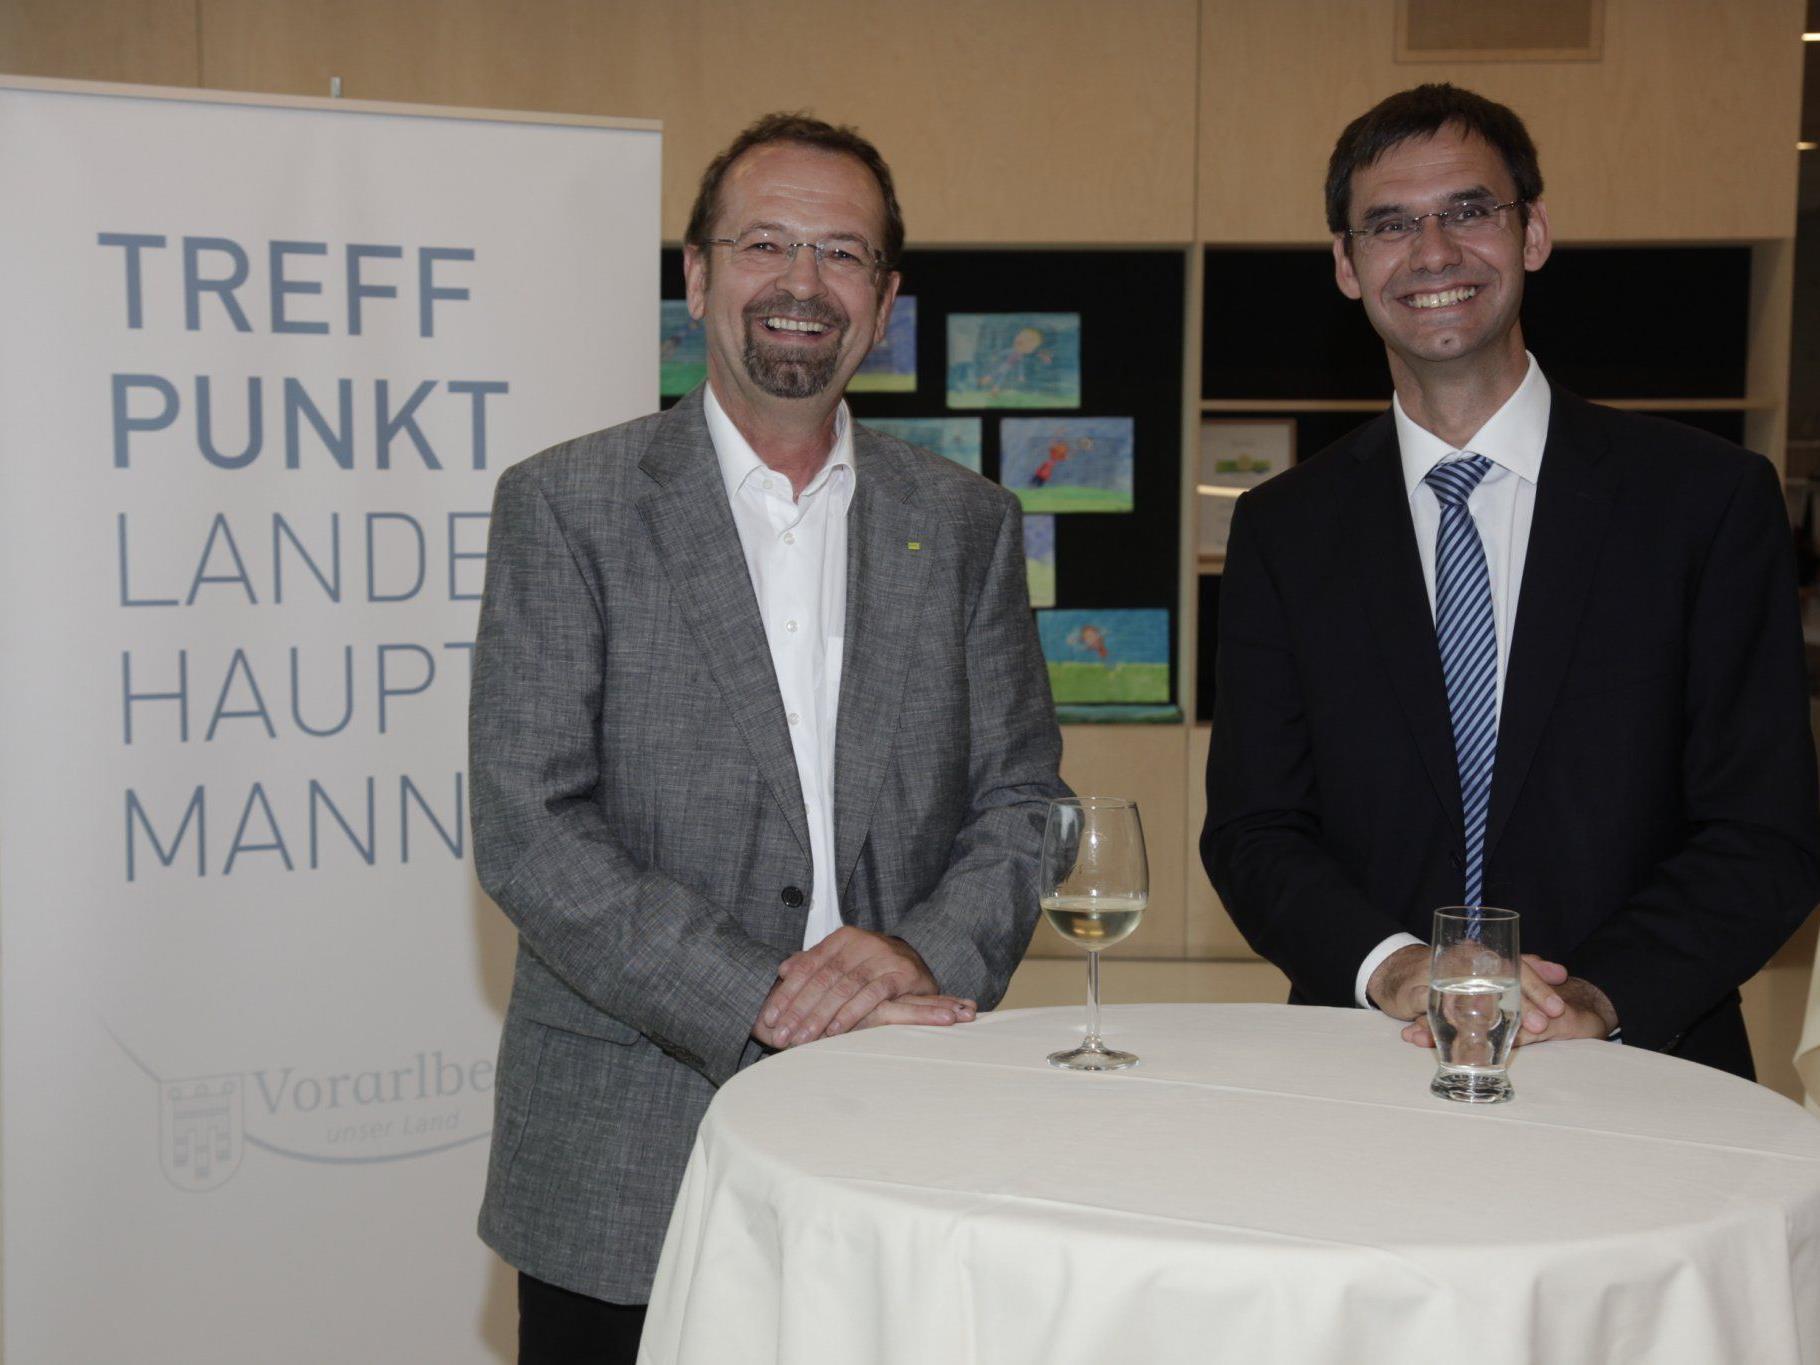 """Treffpunkt Landeshauptmann"": Dialog mit freiwillig Engagierten."